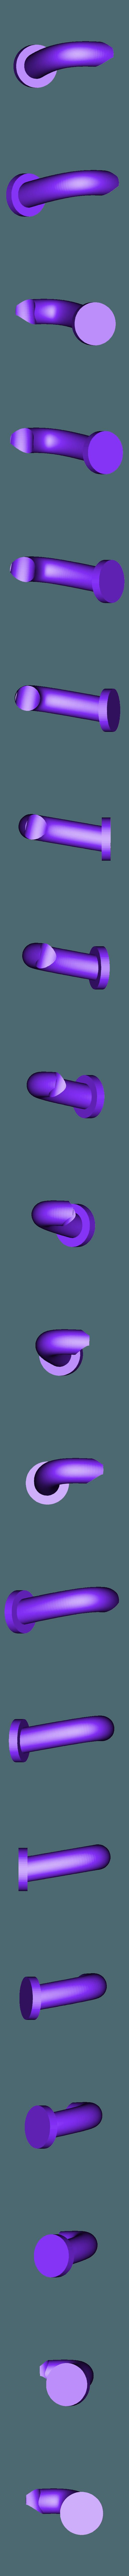 pipe-1.stl Download free STL file Steampunk Oculus Roboticus • 3D print design, cyrusharding